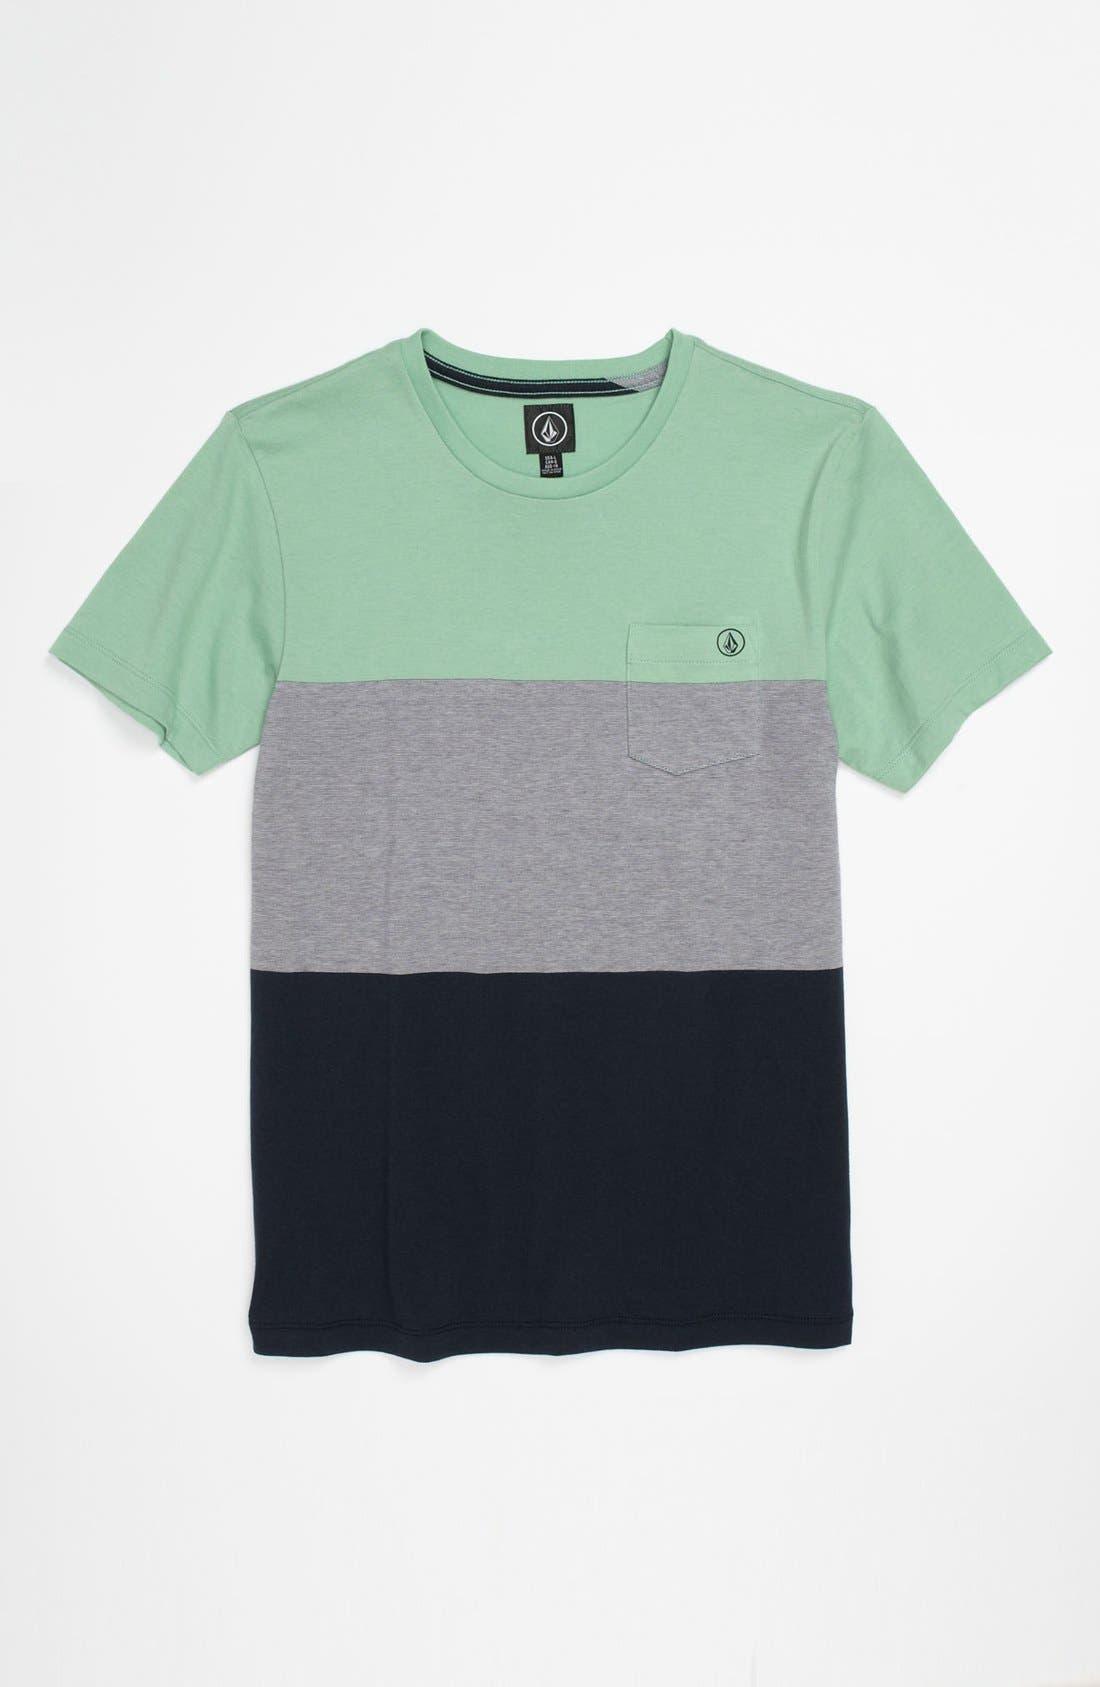 Alternate Image 1 Selected - Volcom 'Blakely' T-Shirt (Big Boys)